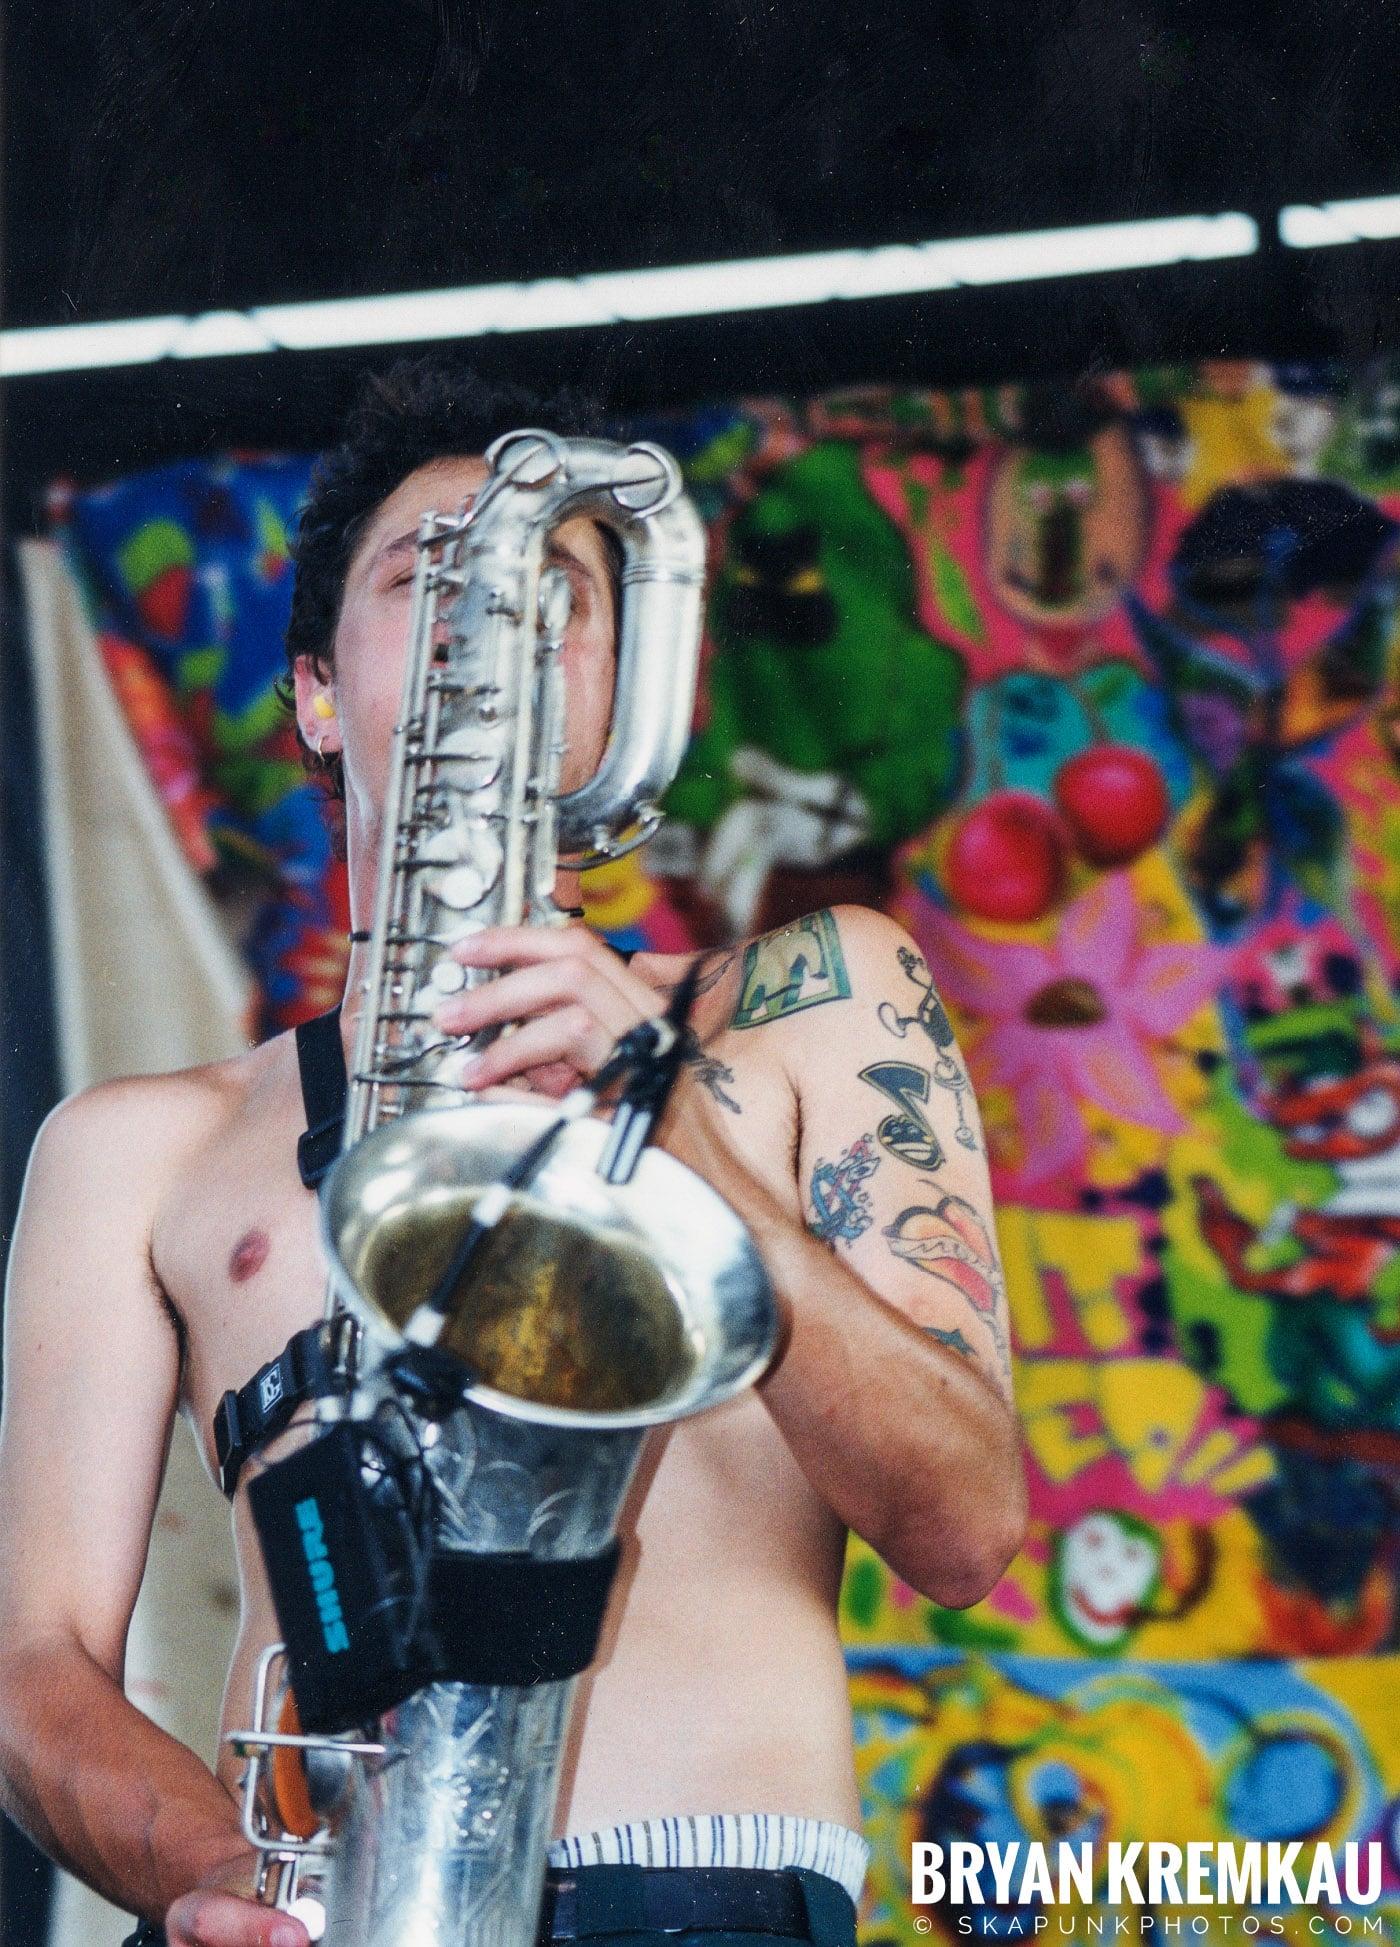 Less Than Jake @ Vans Warped Tour, Randall's Island, NYC - 7.16.99 (3)